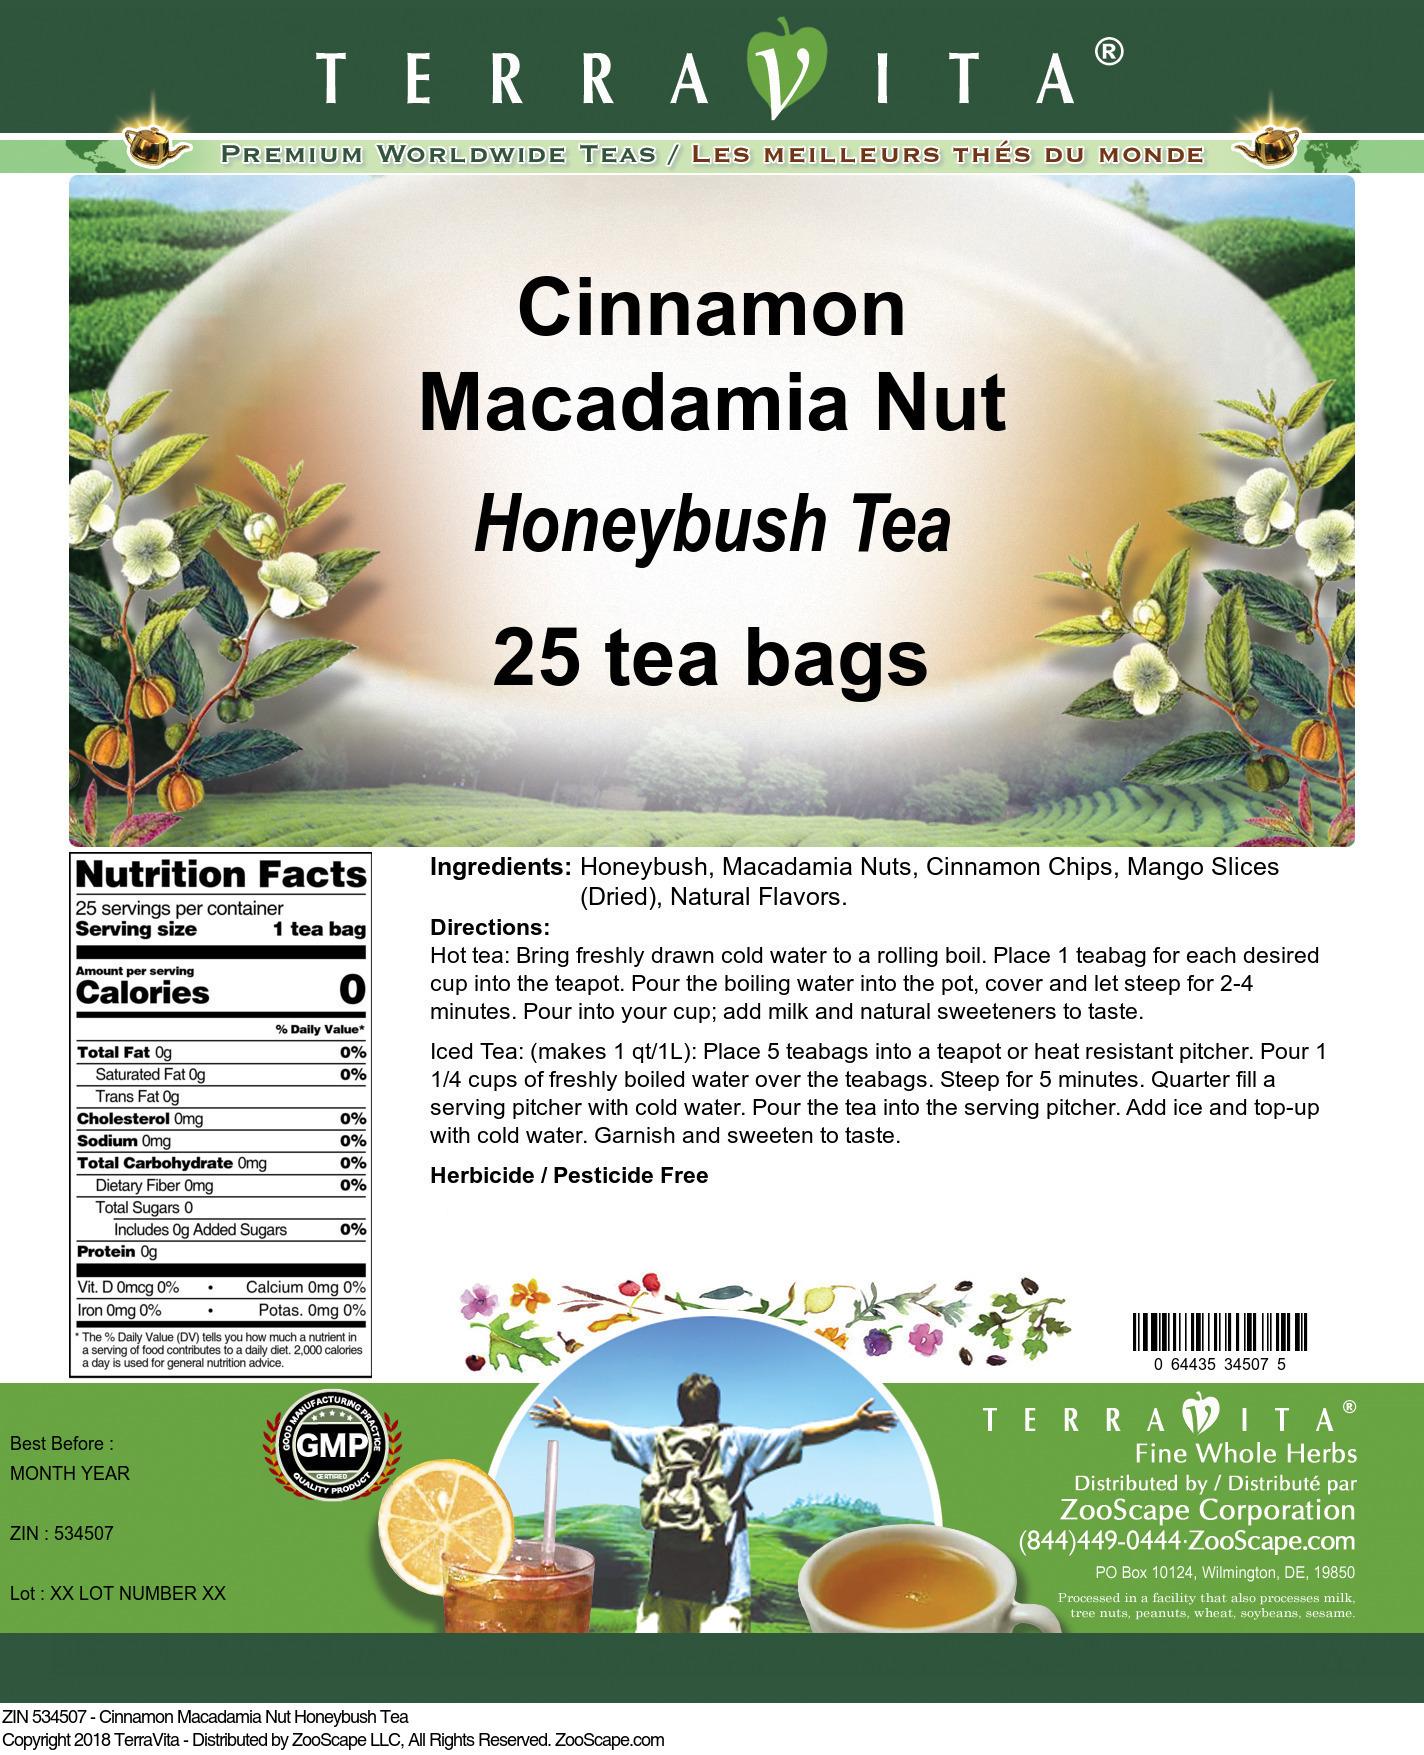 Cinnamon Macadamia Nut Honeybush Tea